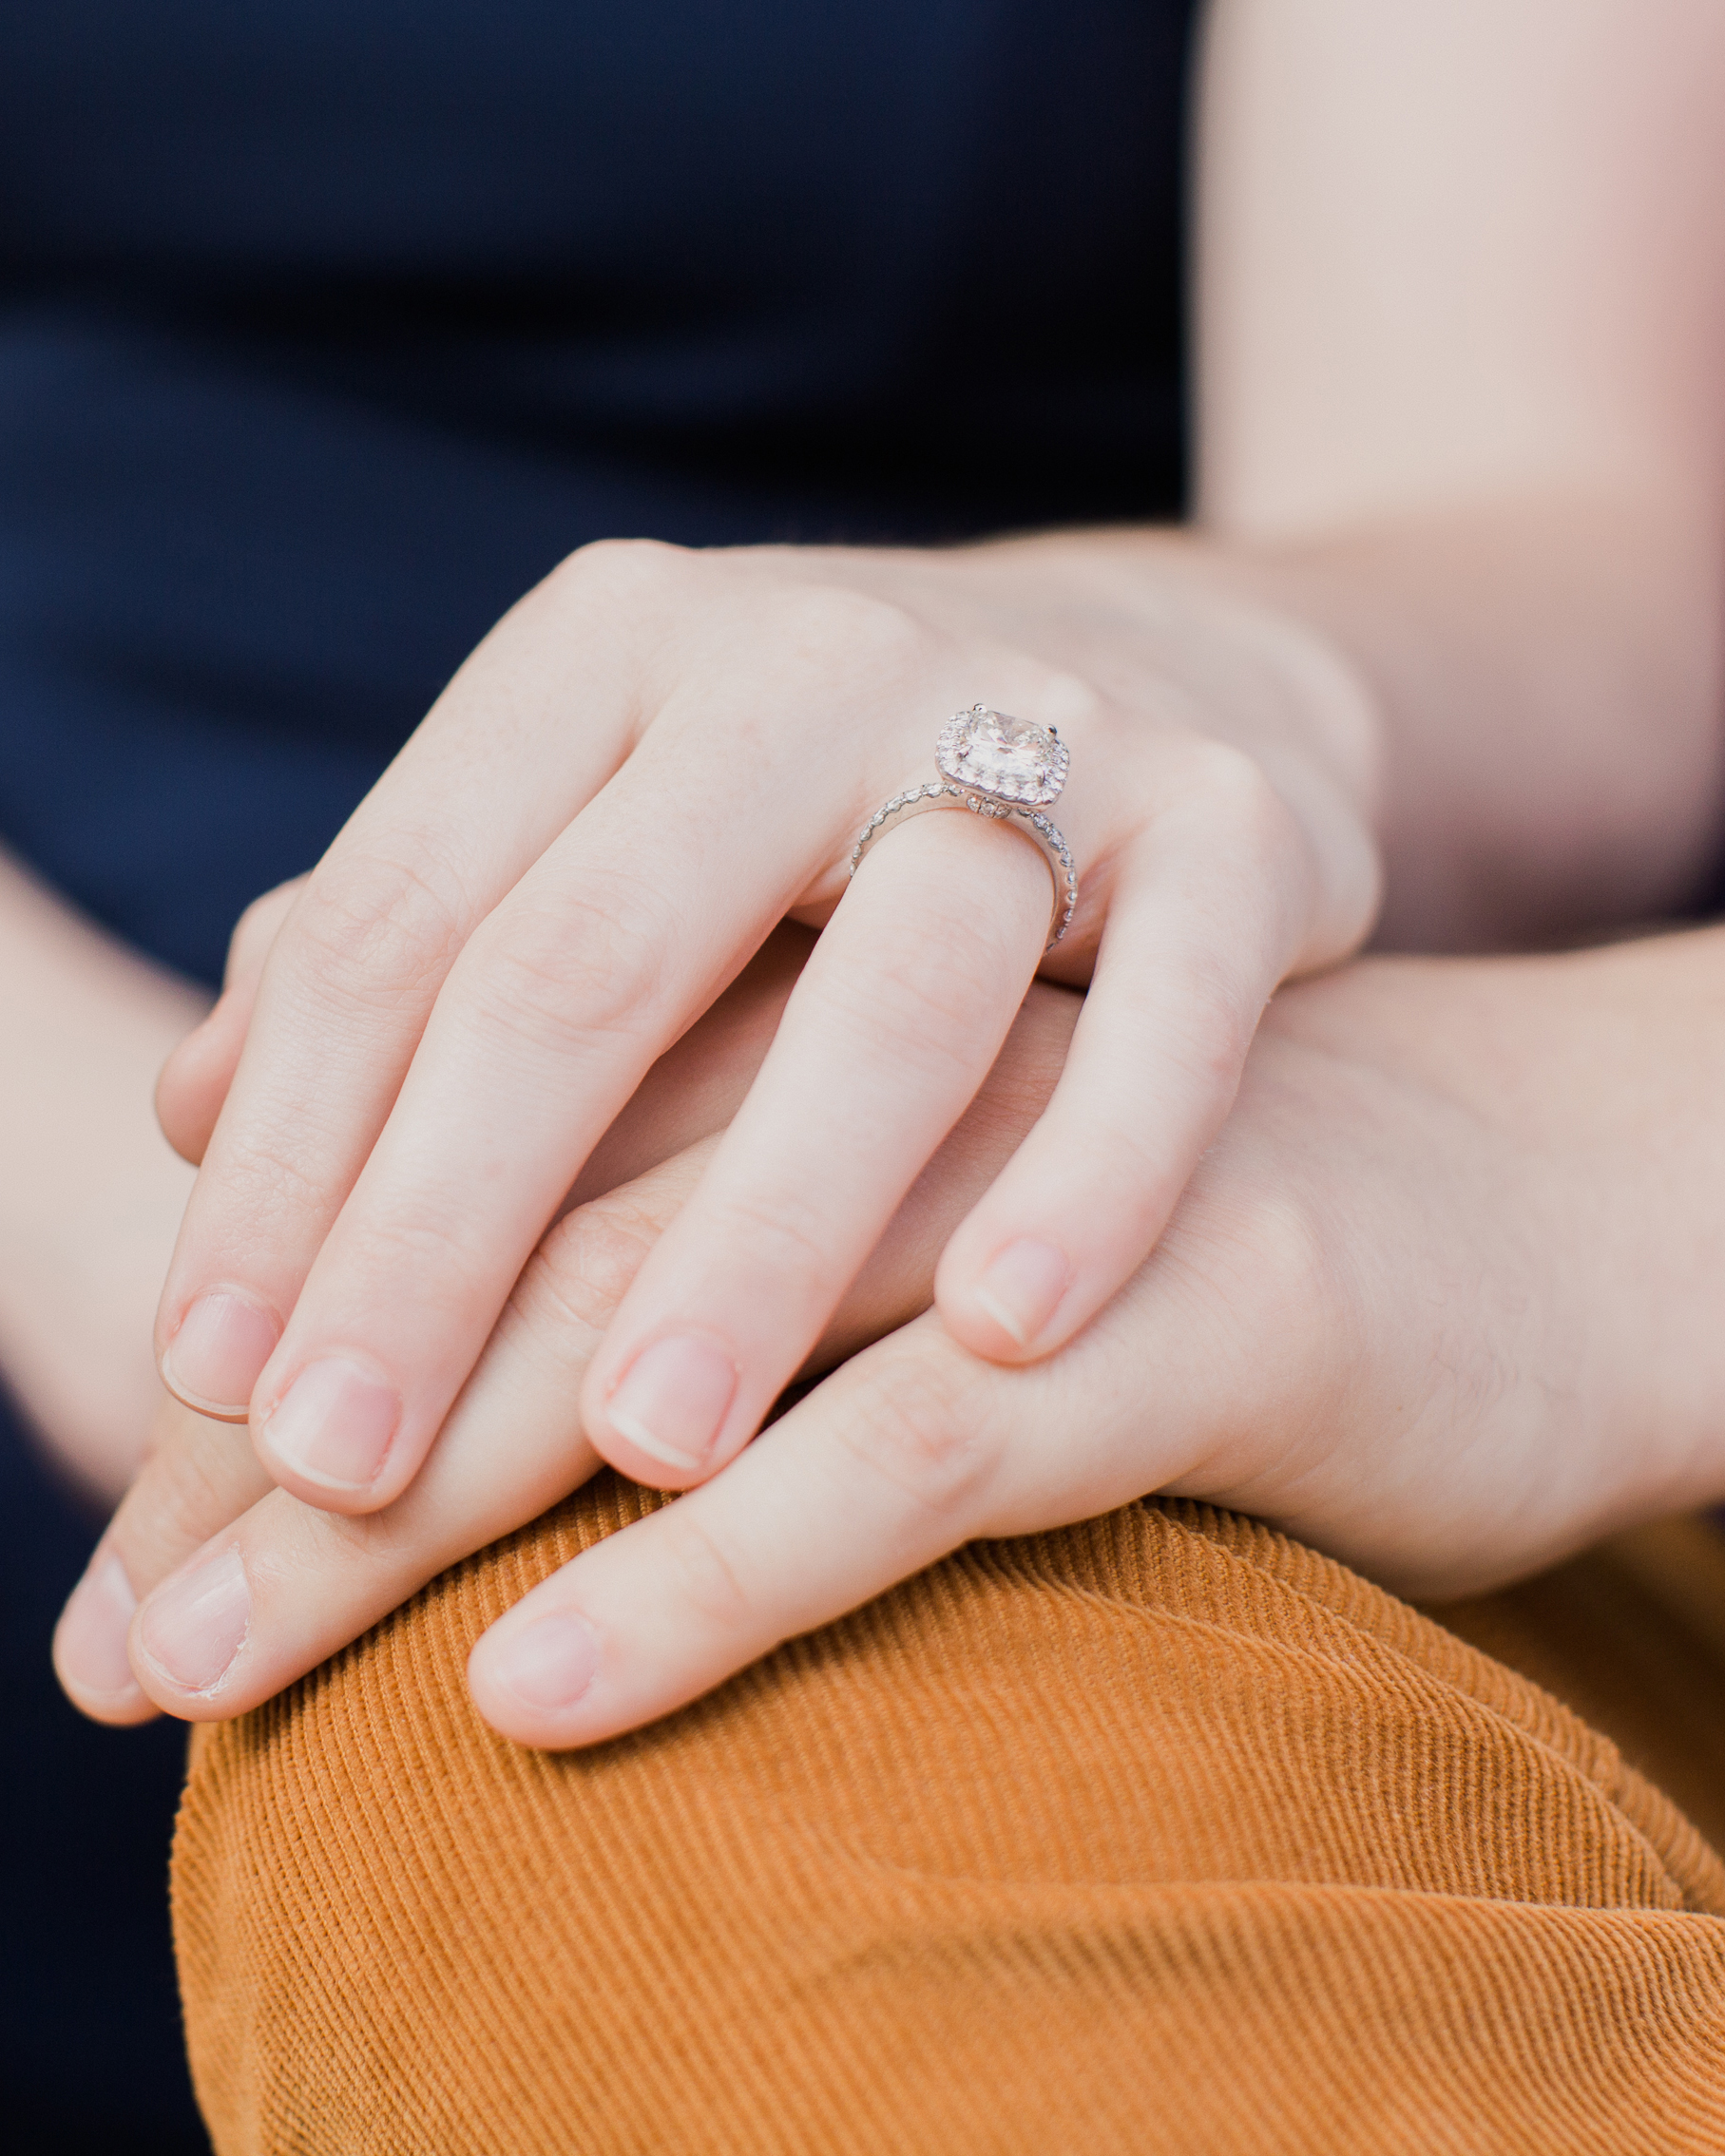 proposals-almost-gone-wrong-cristina-jason-new-ring-closeup-0825.jpg